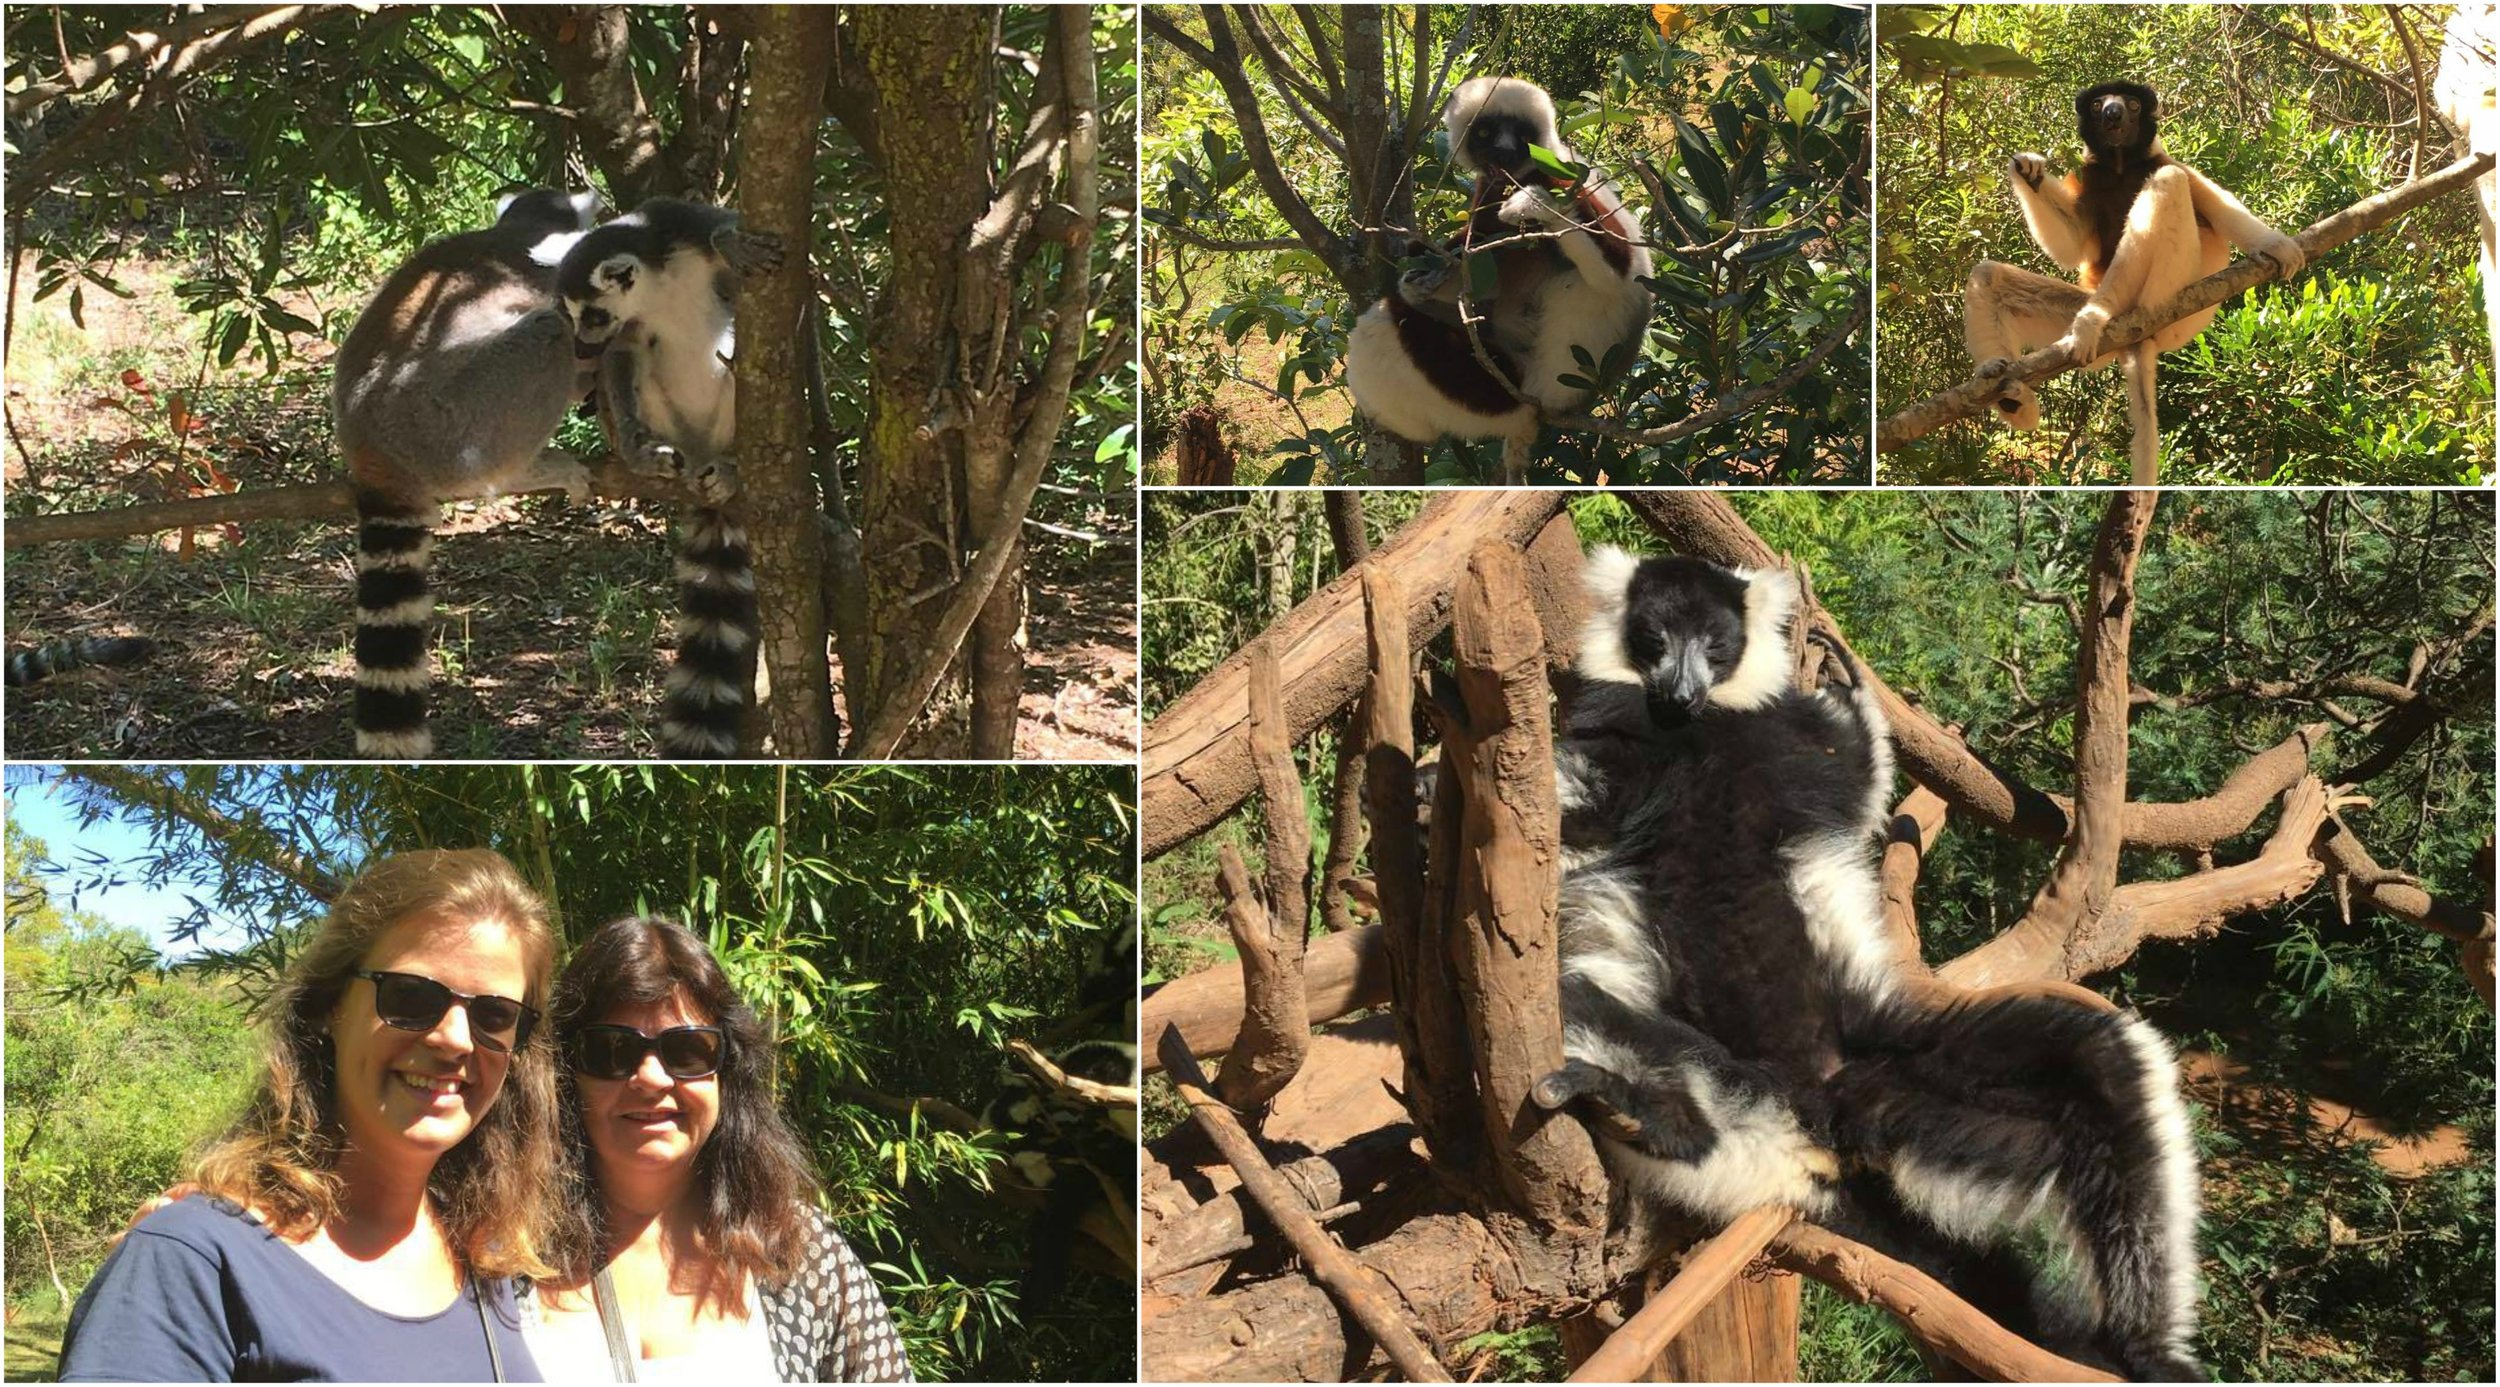 The lemur park outside of Antananarivo